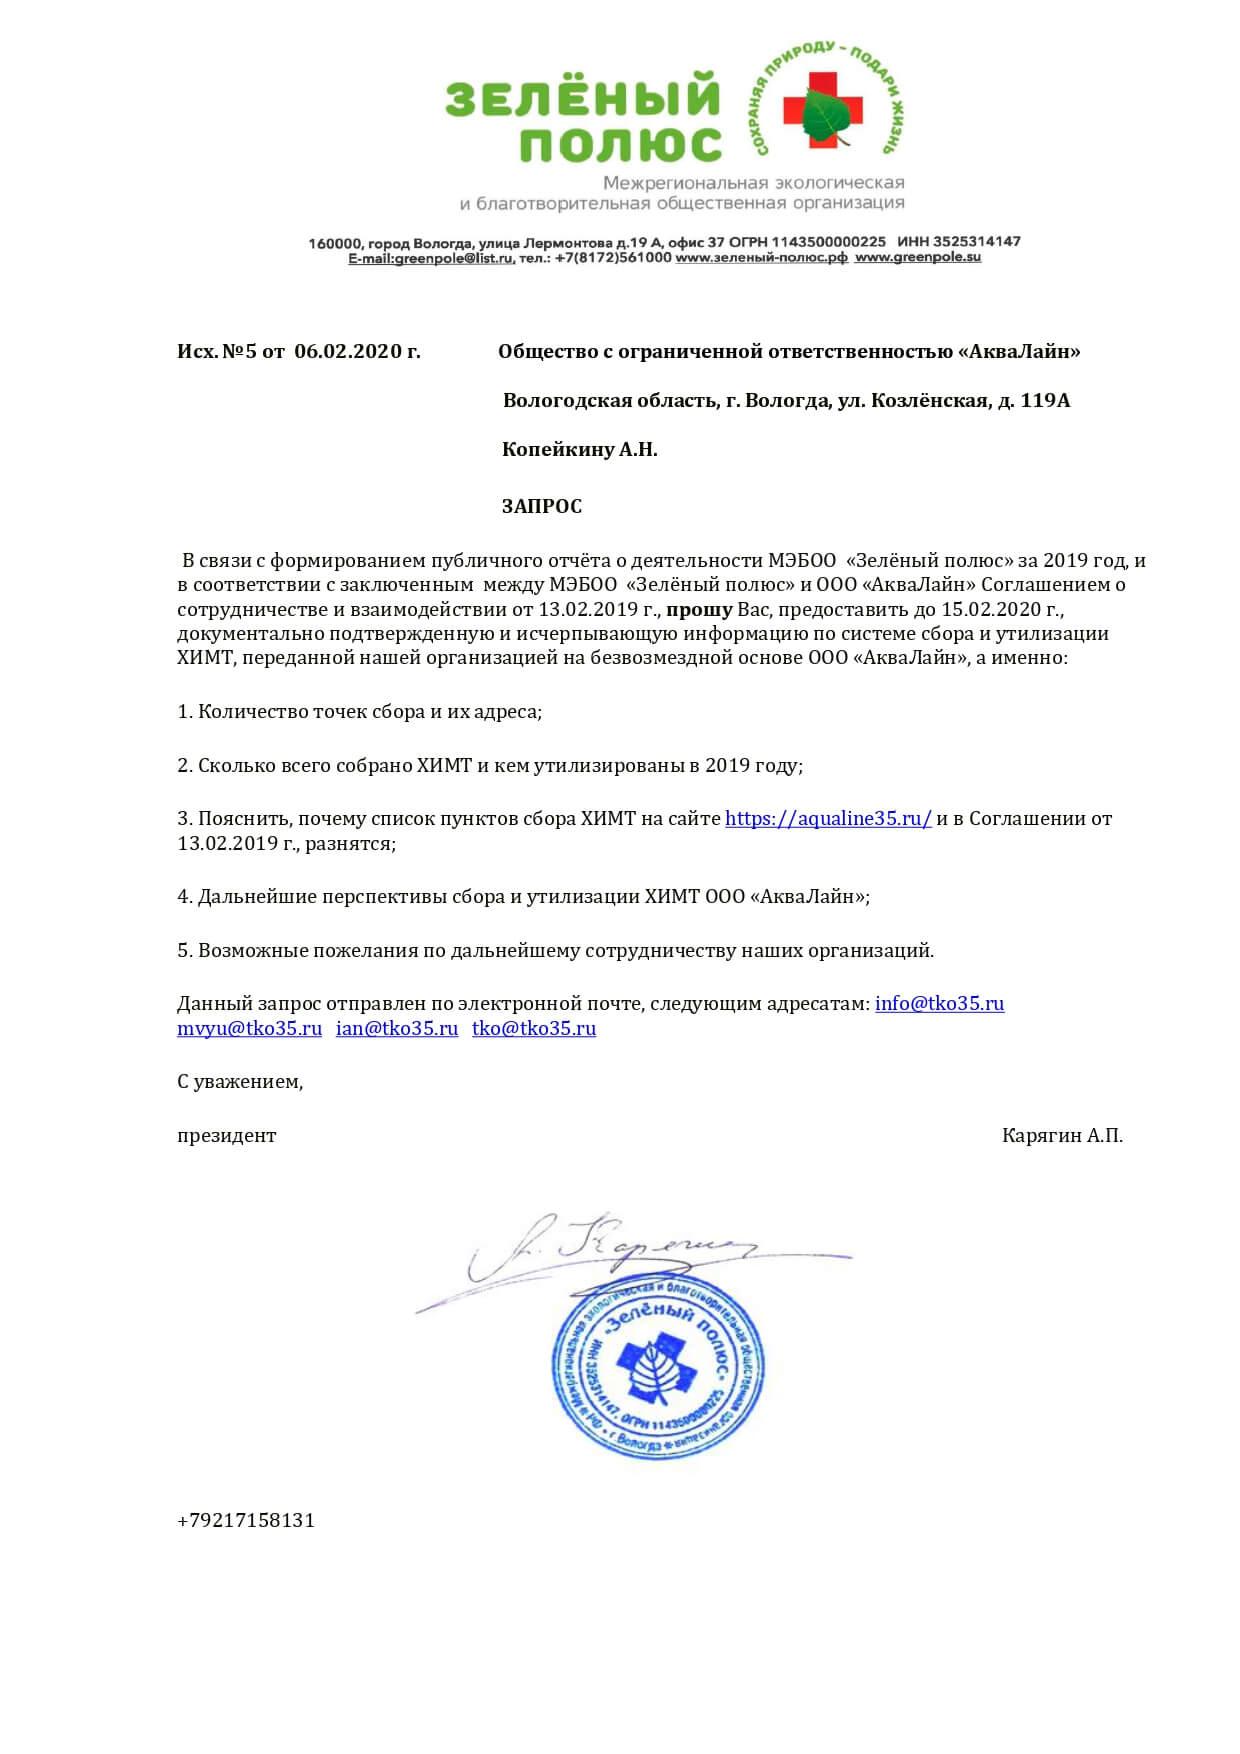 ish-5-ot-06-02-2020-g-zapros-ooo-akvalajn-batarejki_page-0001-1